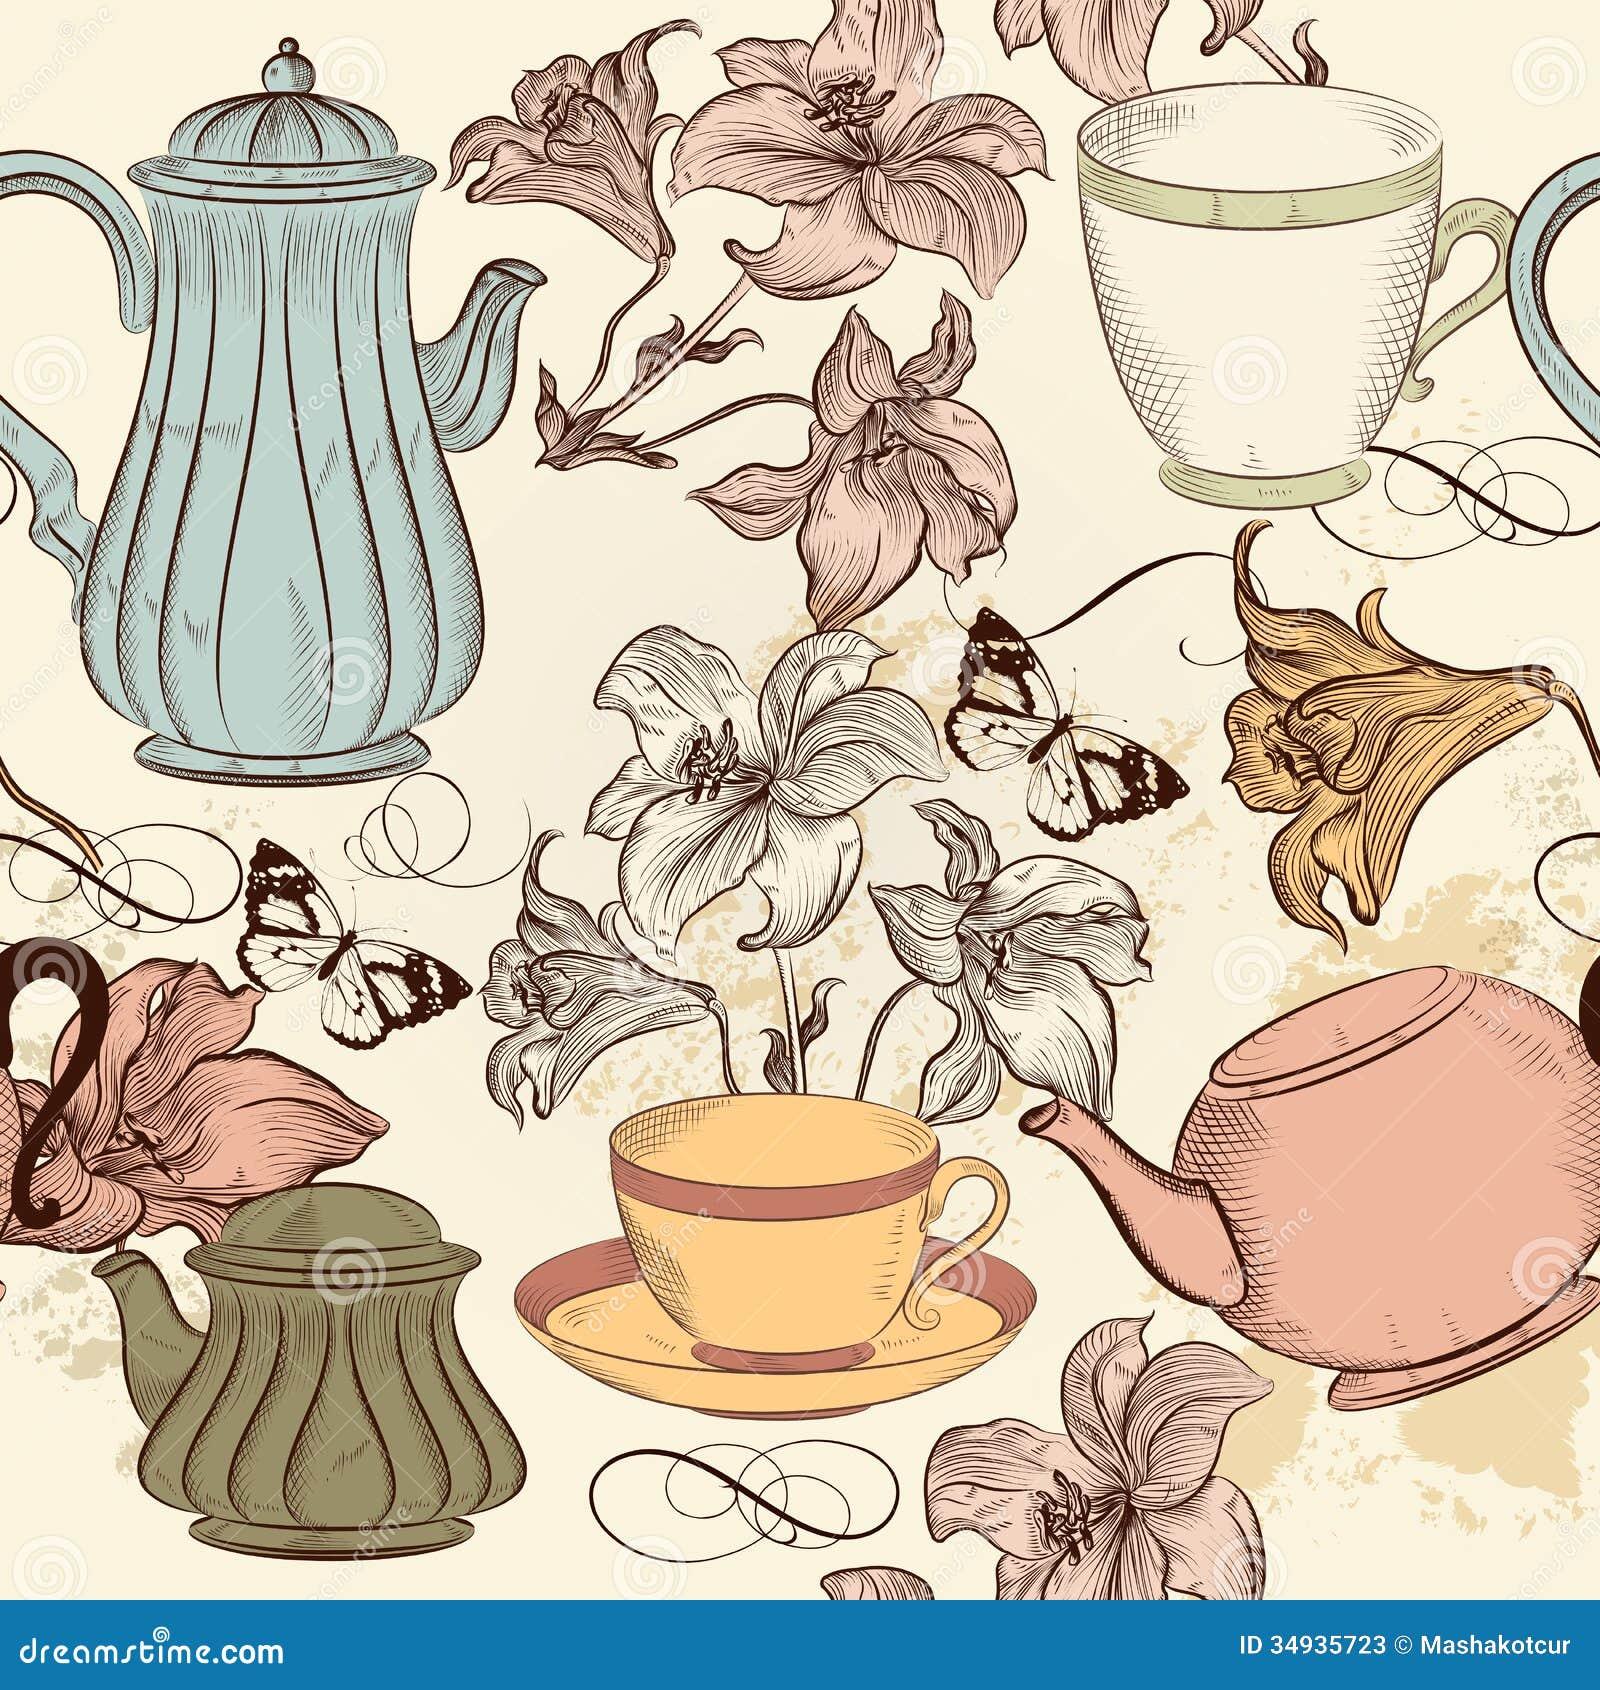 vintage tea cup wallpaper - photo #6